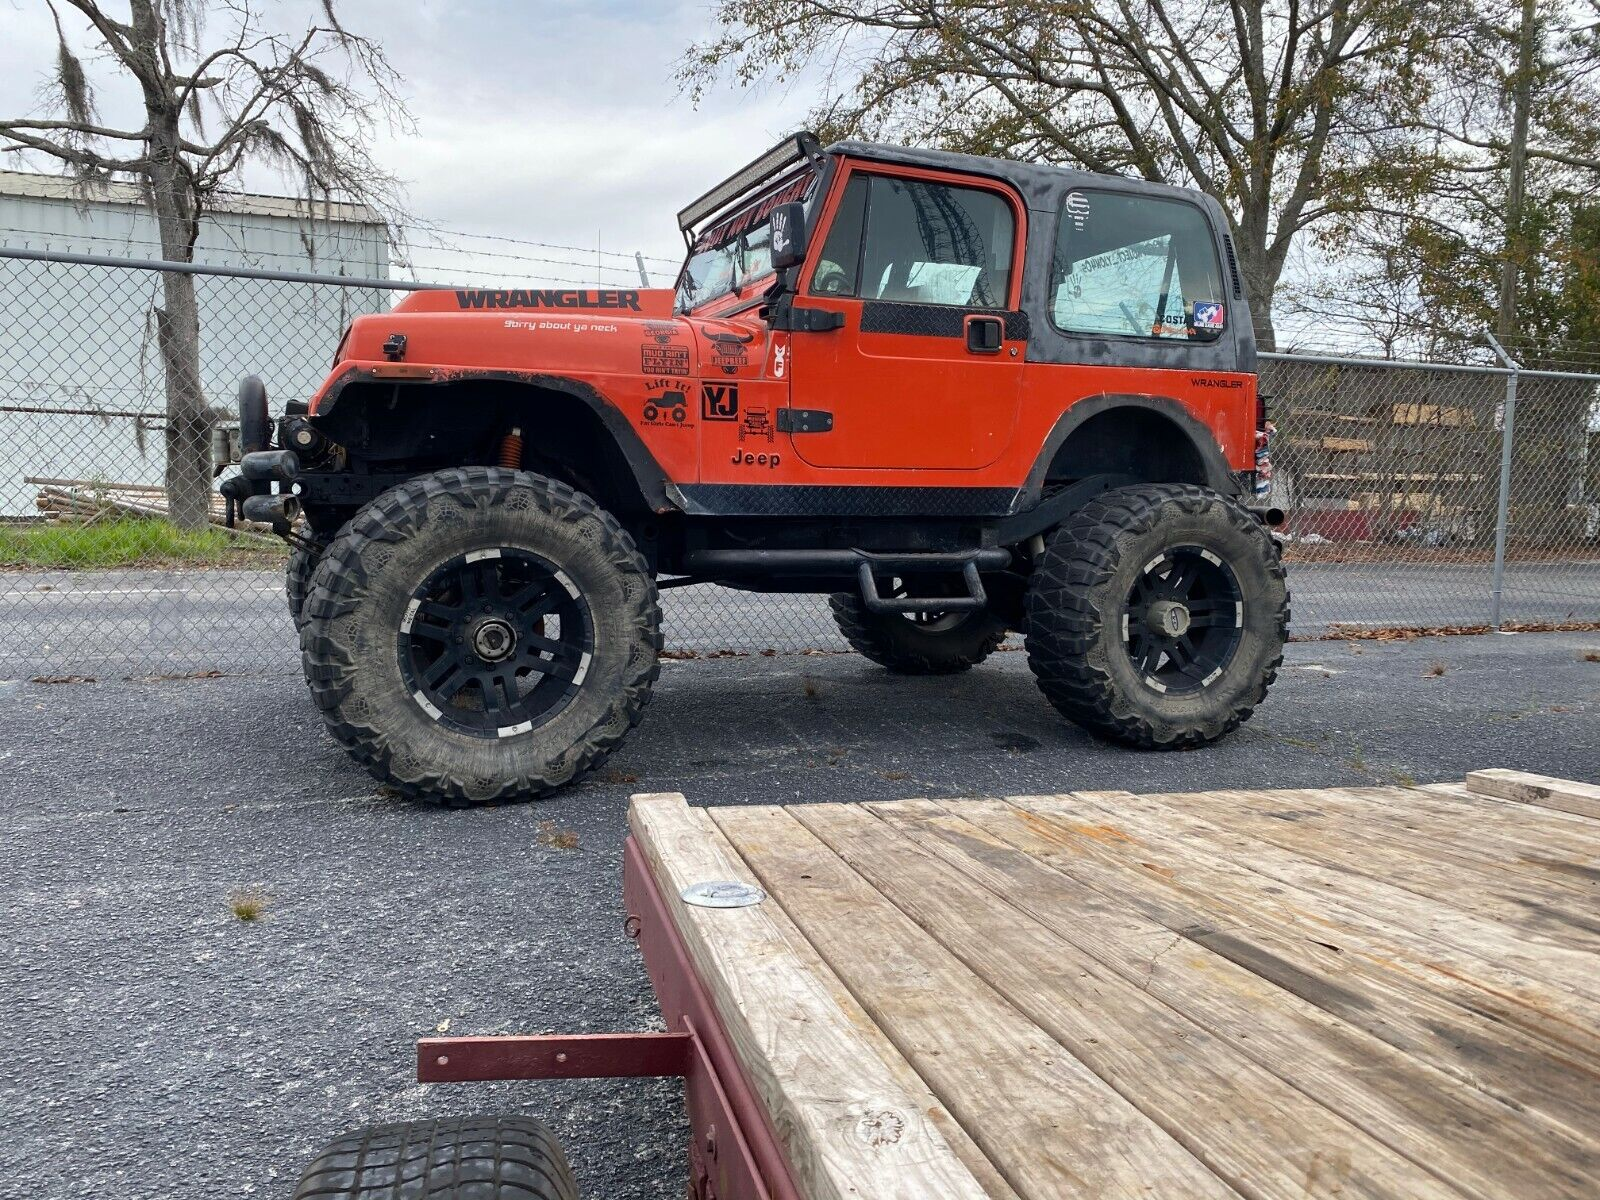 1988 Jeep Wrangler  1988 JEEP WRANGLER YJ Custom. One of a Kind!!